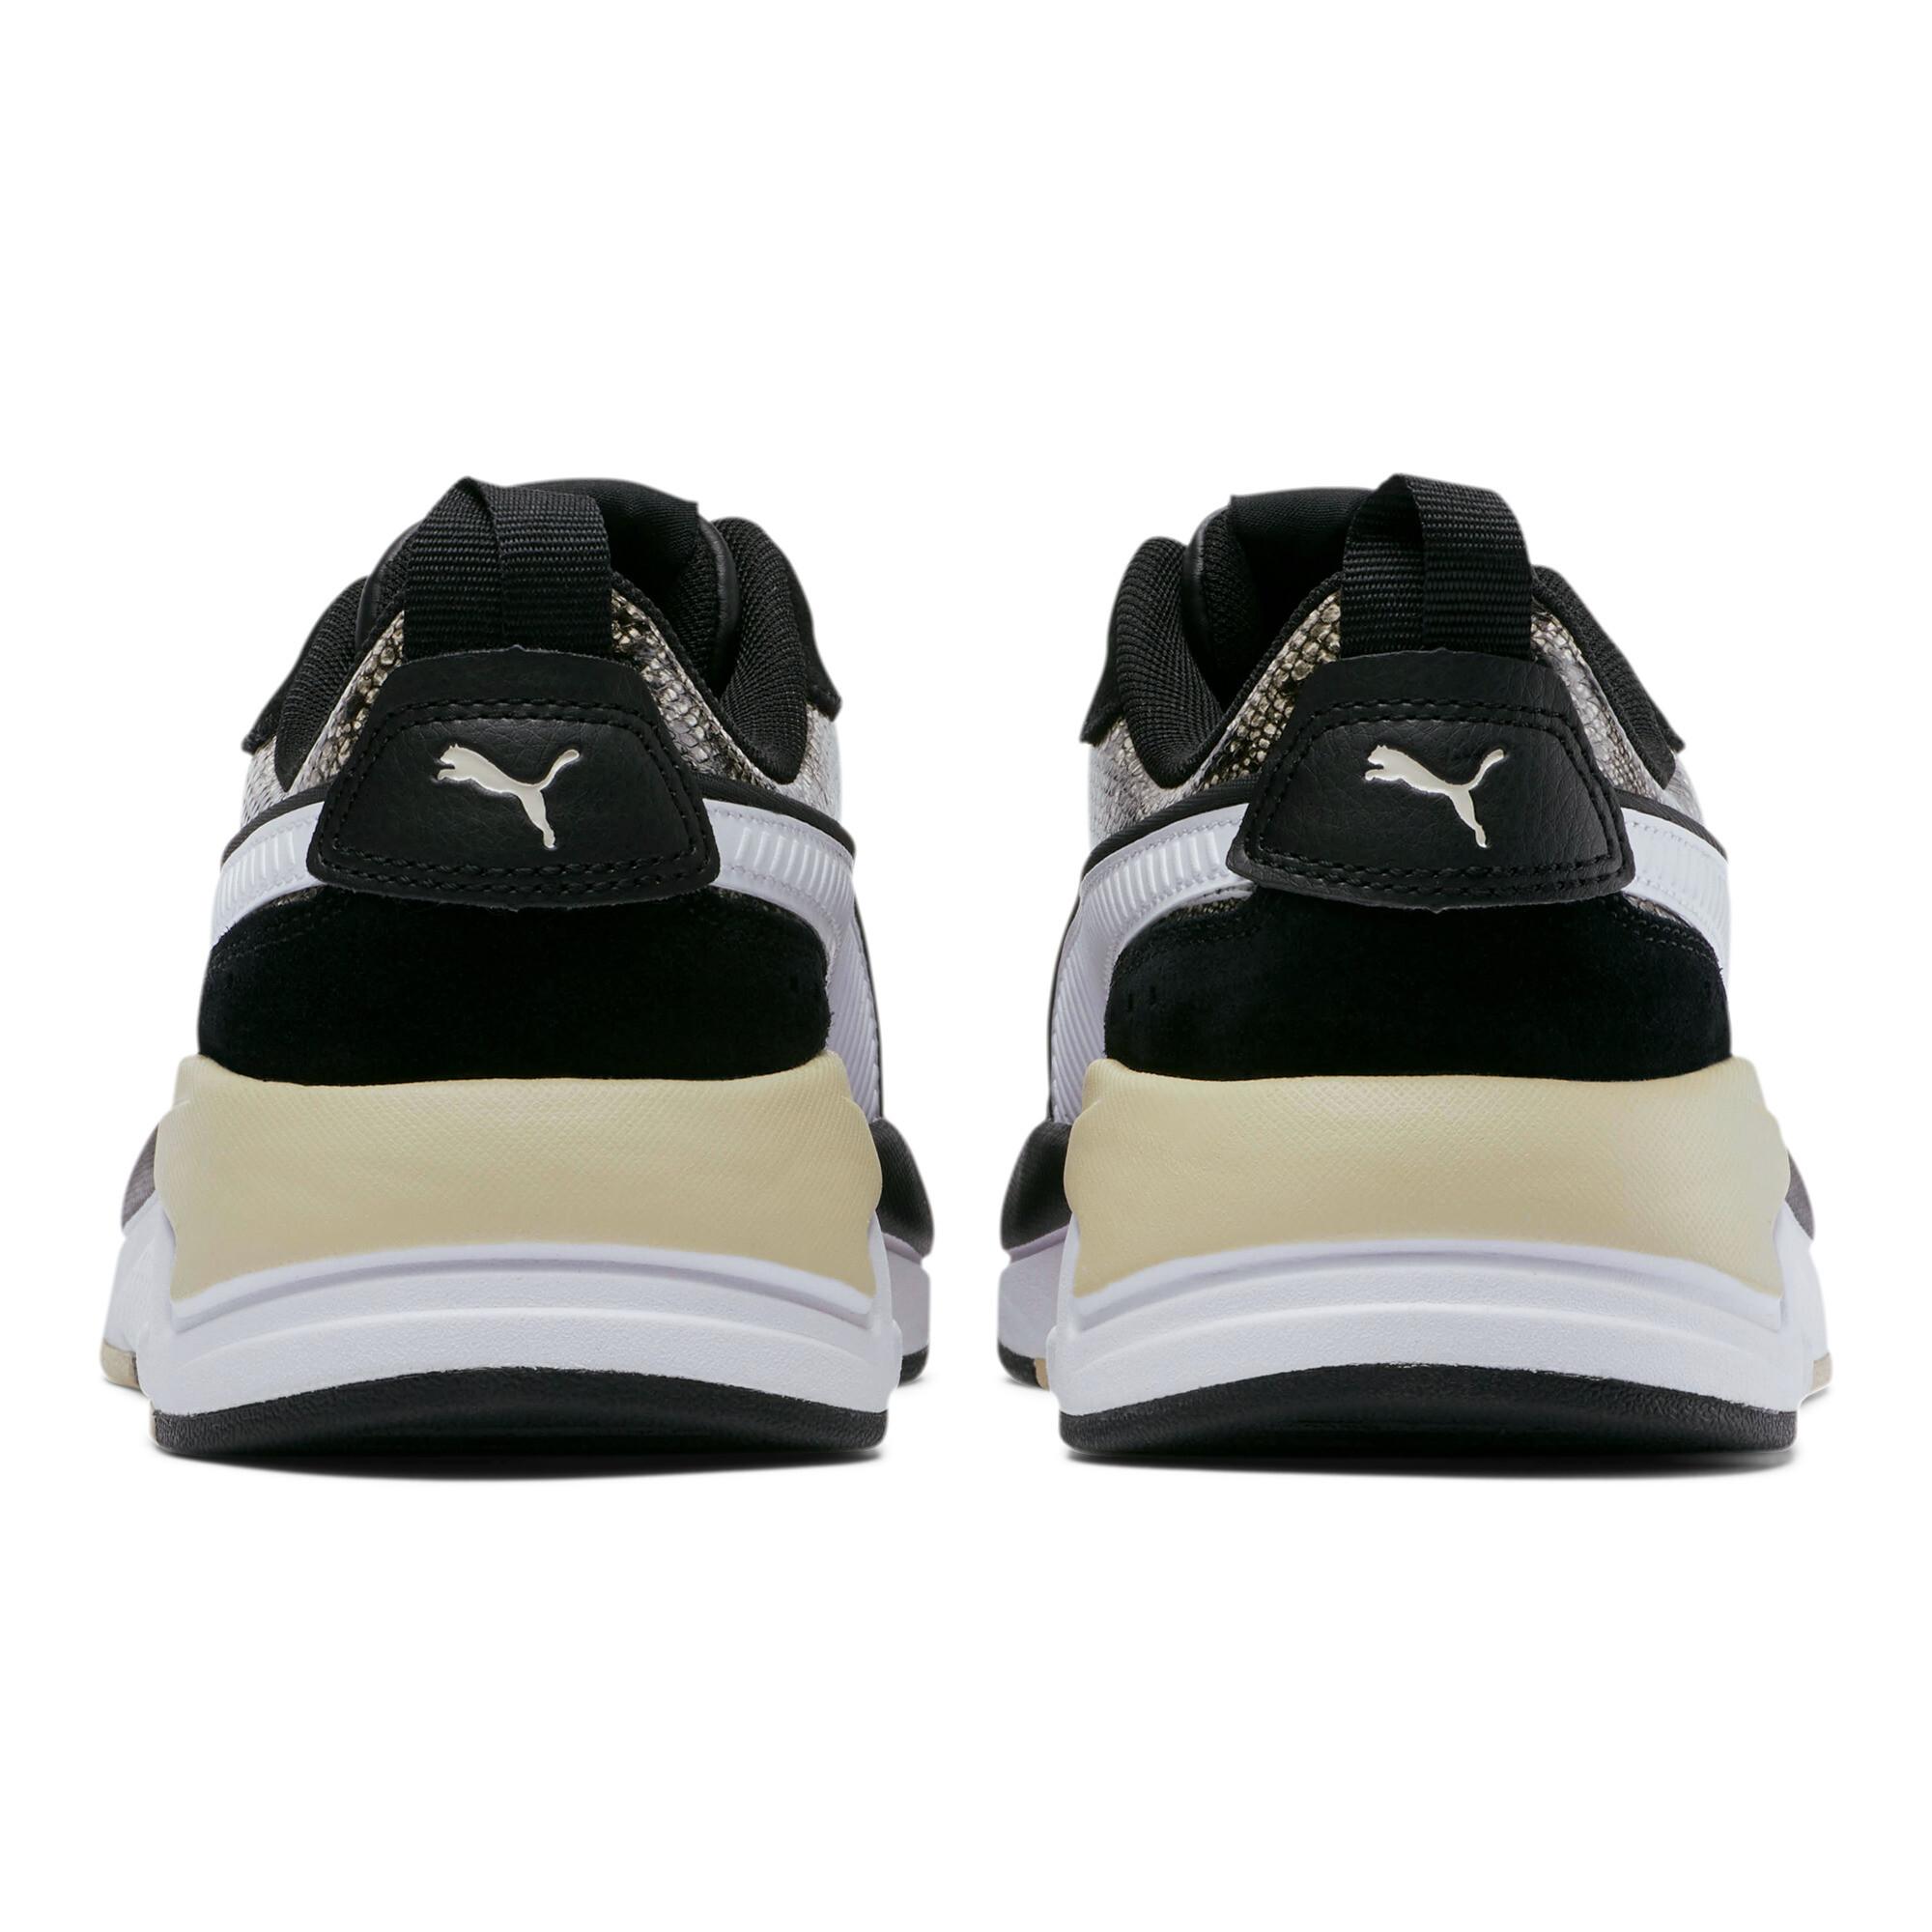 PUMA-Women-039-s-X-RAY-Reptile-Sneakers thumbnail 3